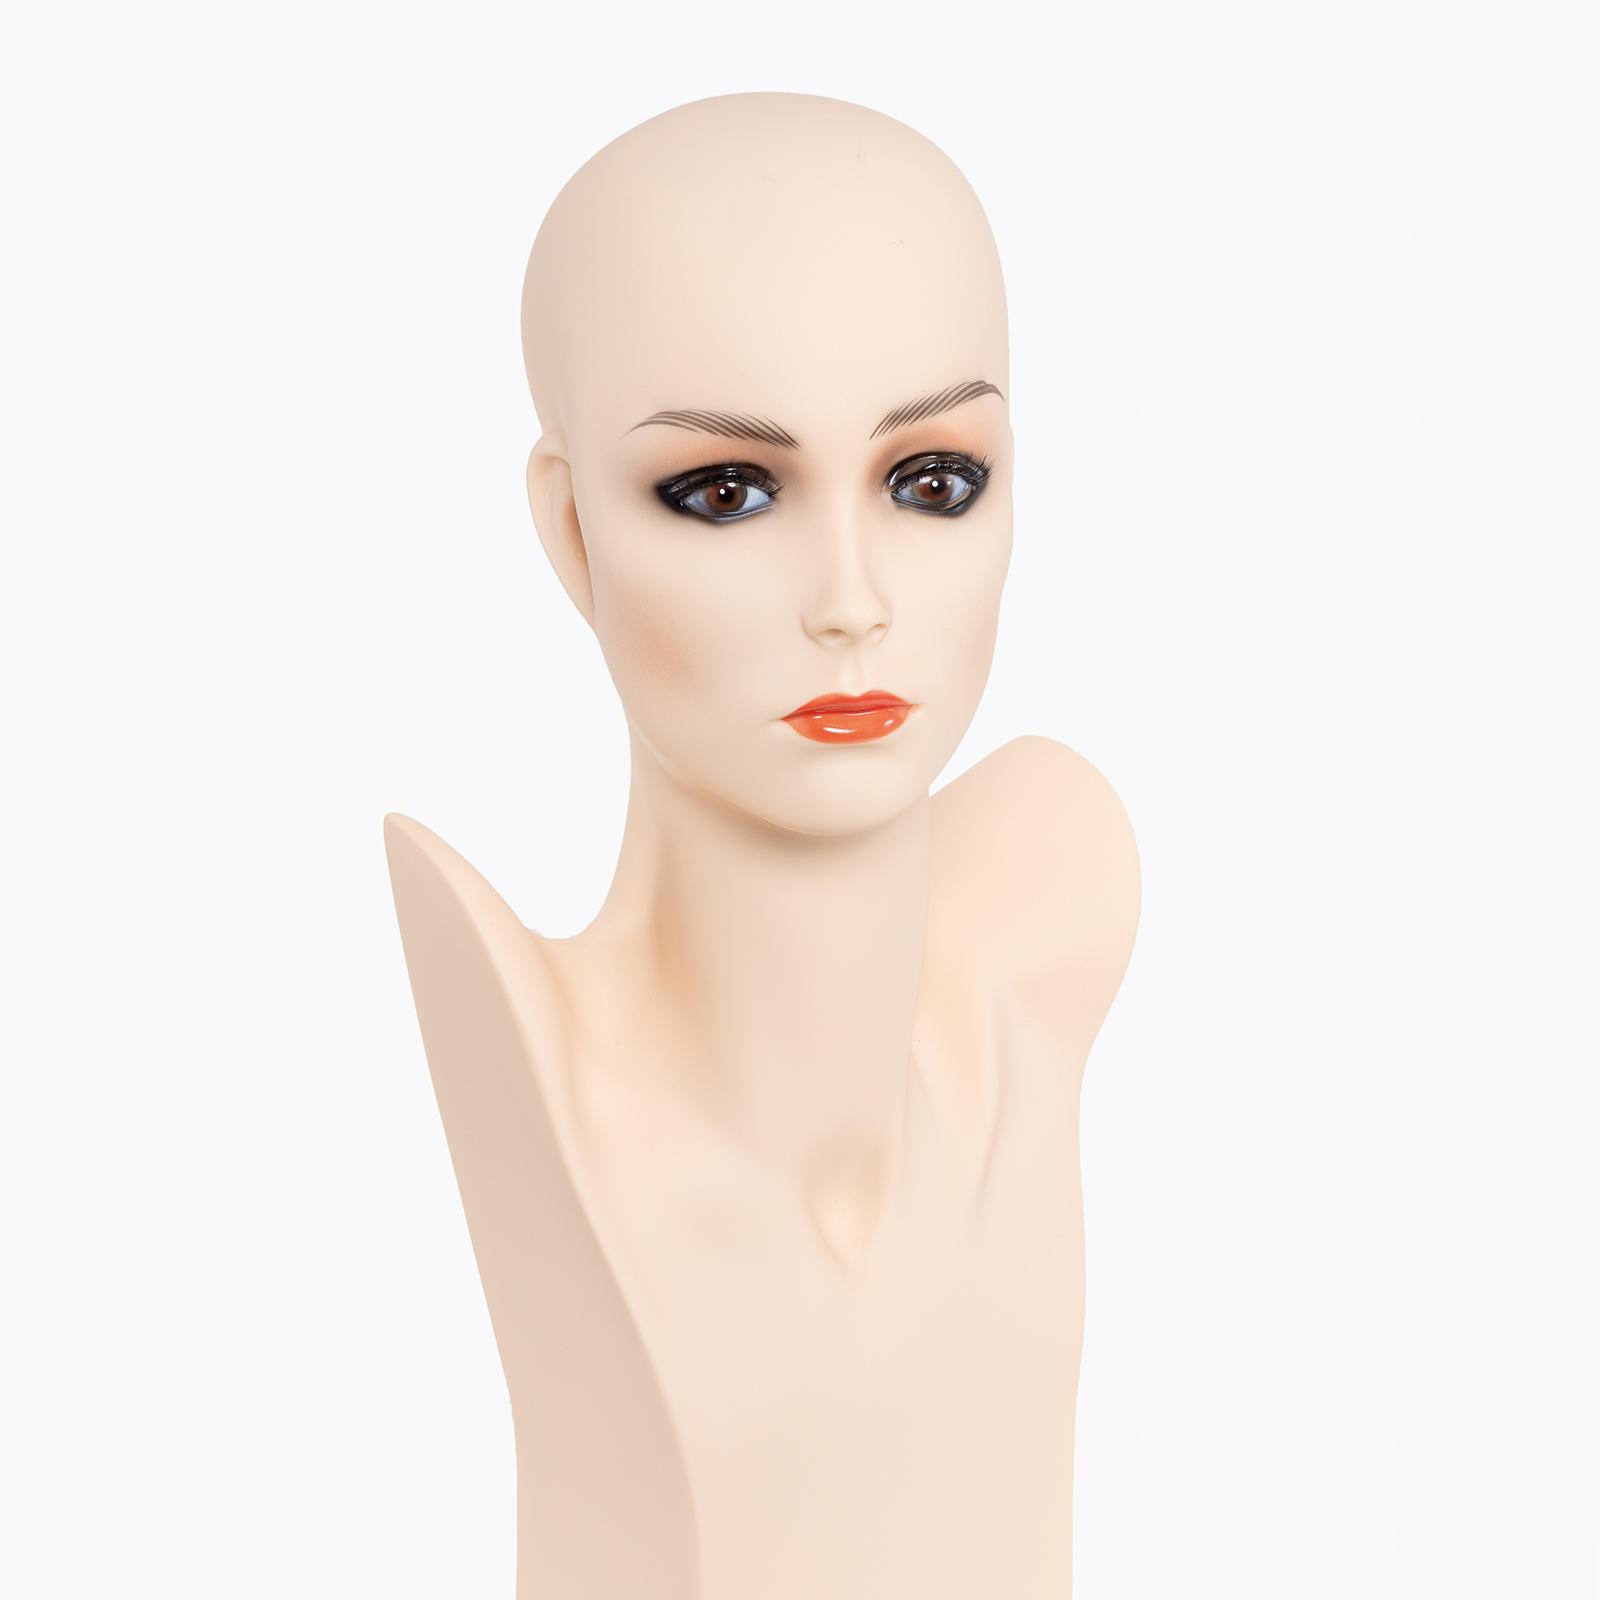 Mannequin head large ellen wille 55cm